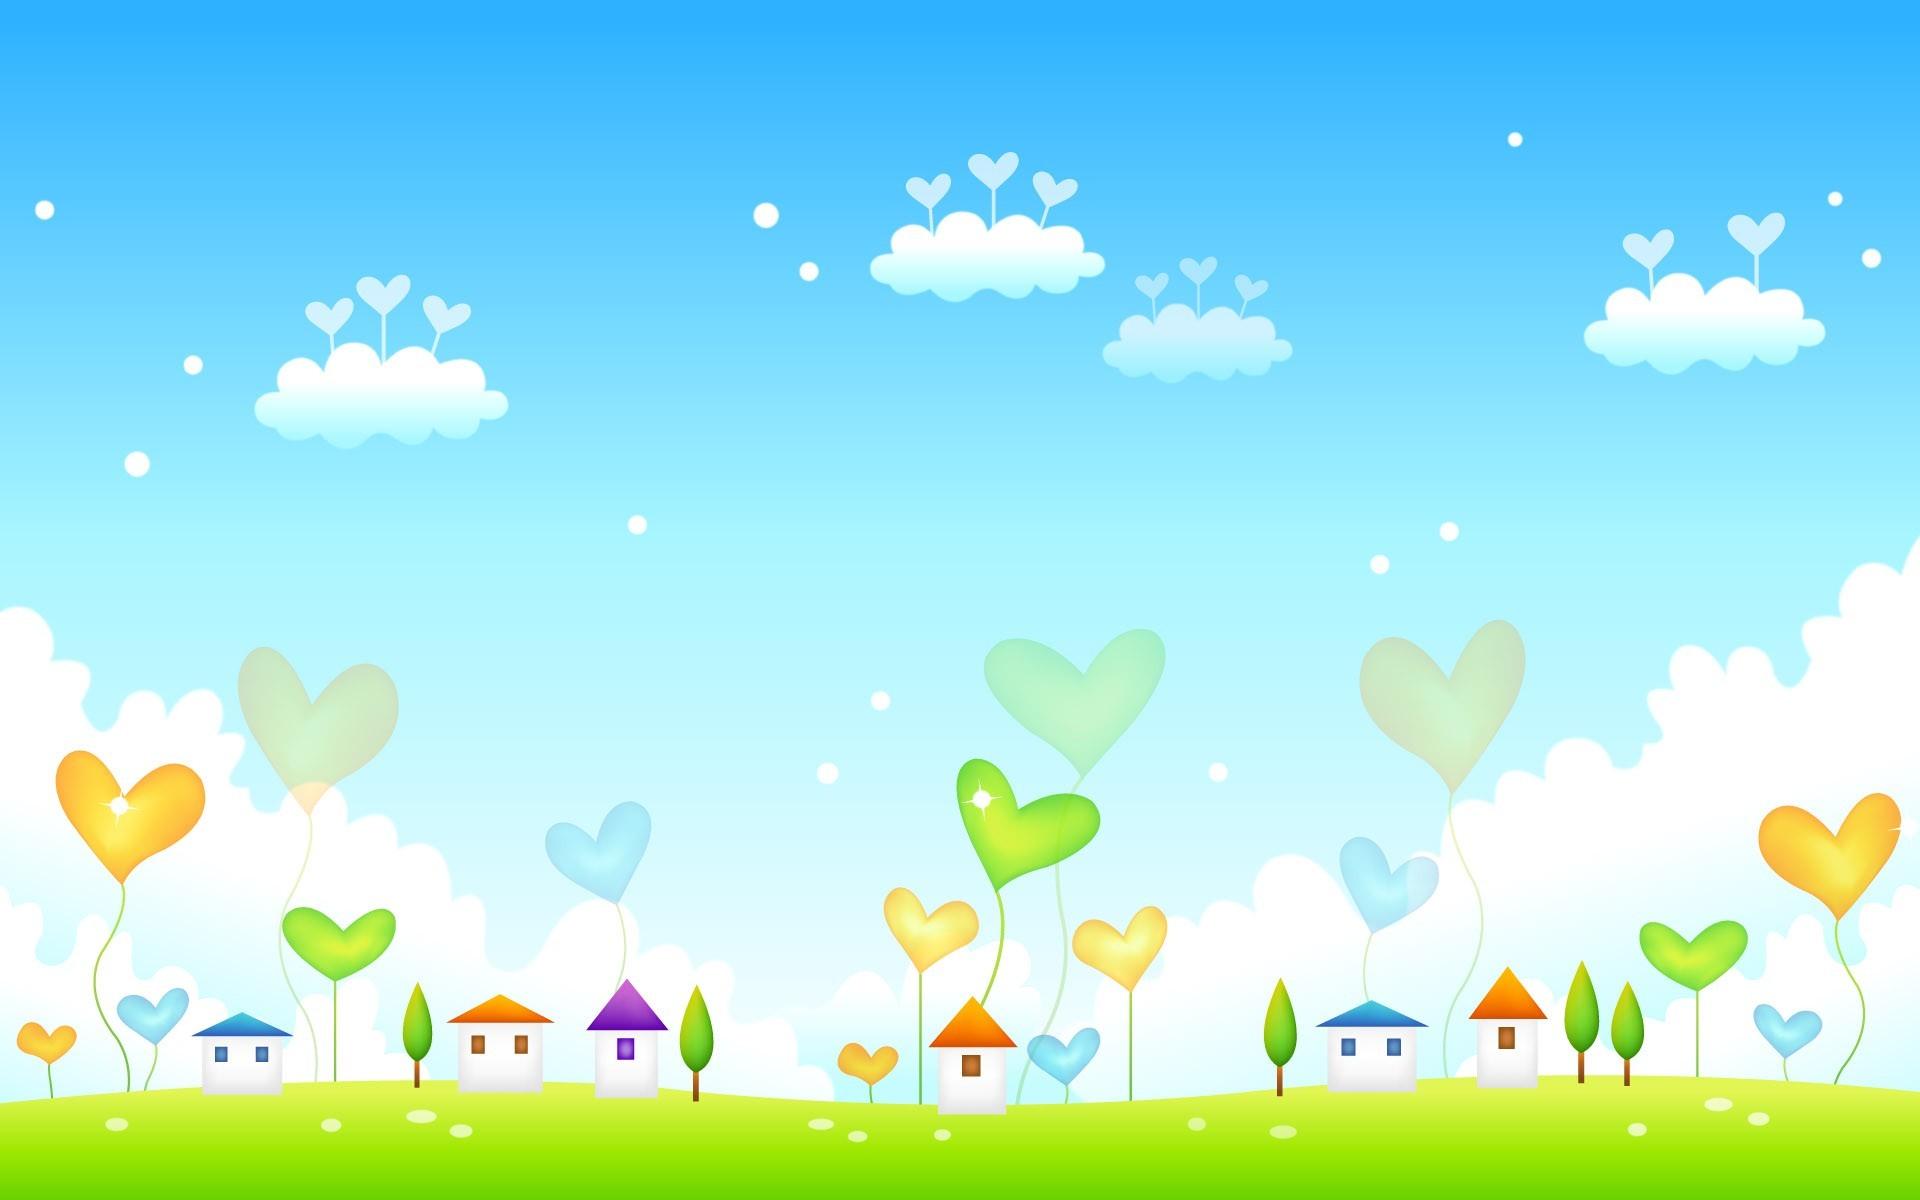 Kids Desktop Backgrounds Wallpaper Wallpapers For Kids Wallpapers)